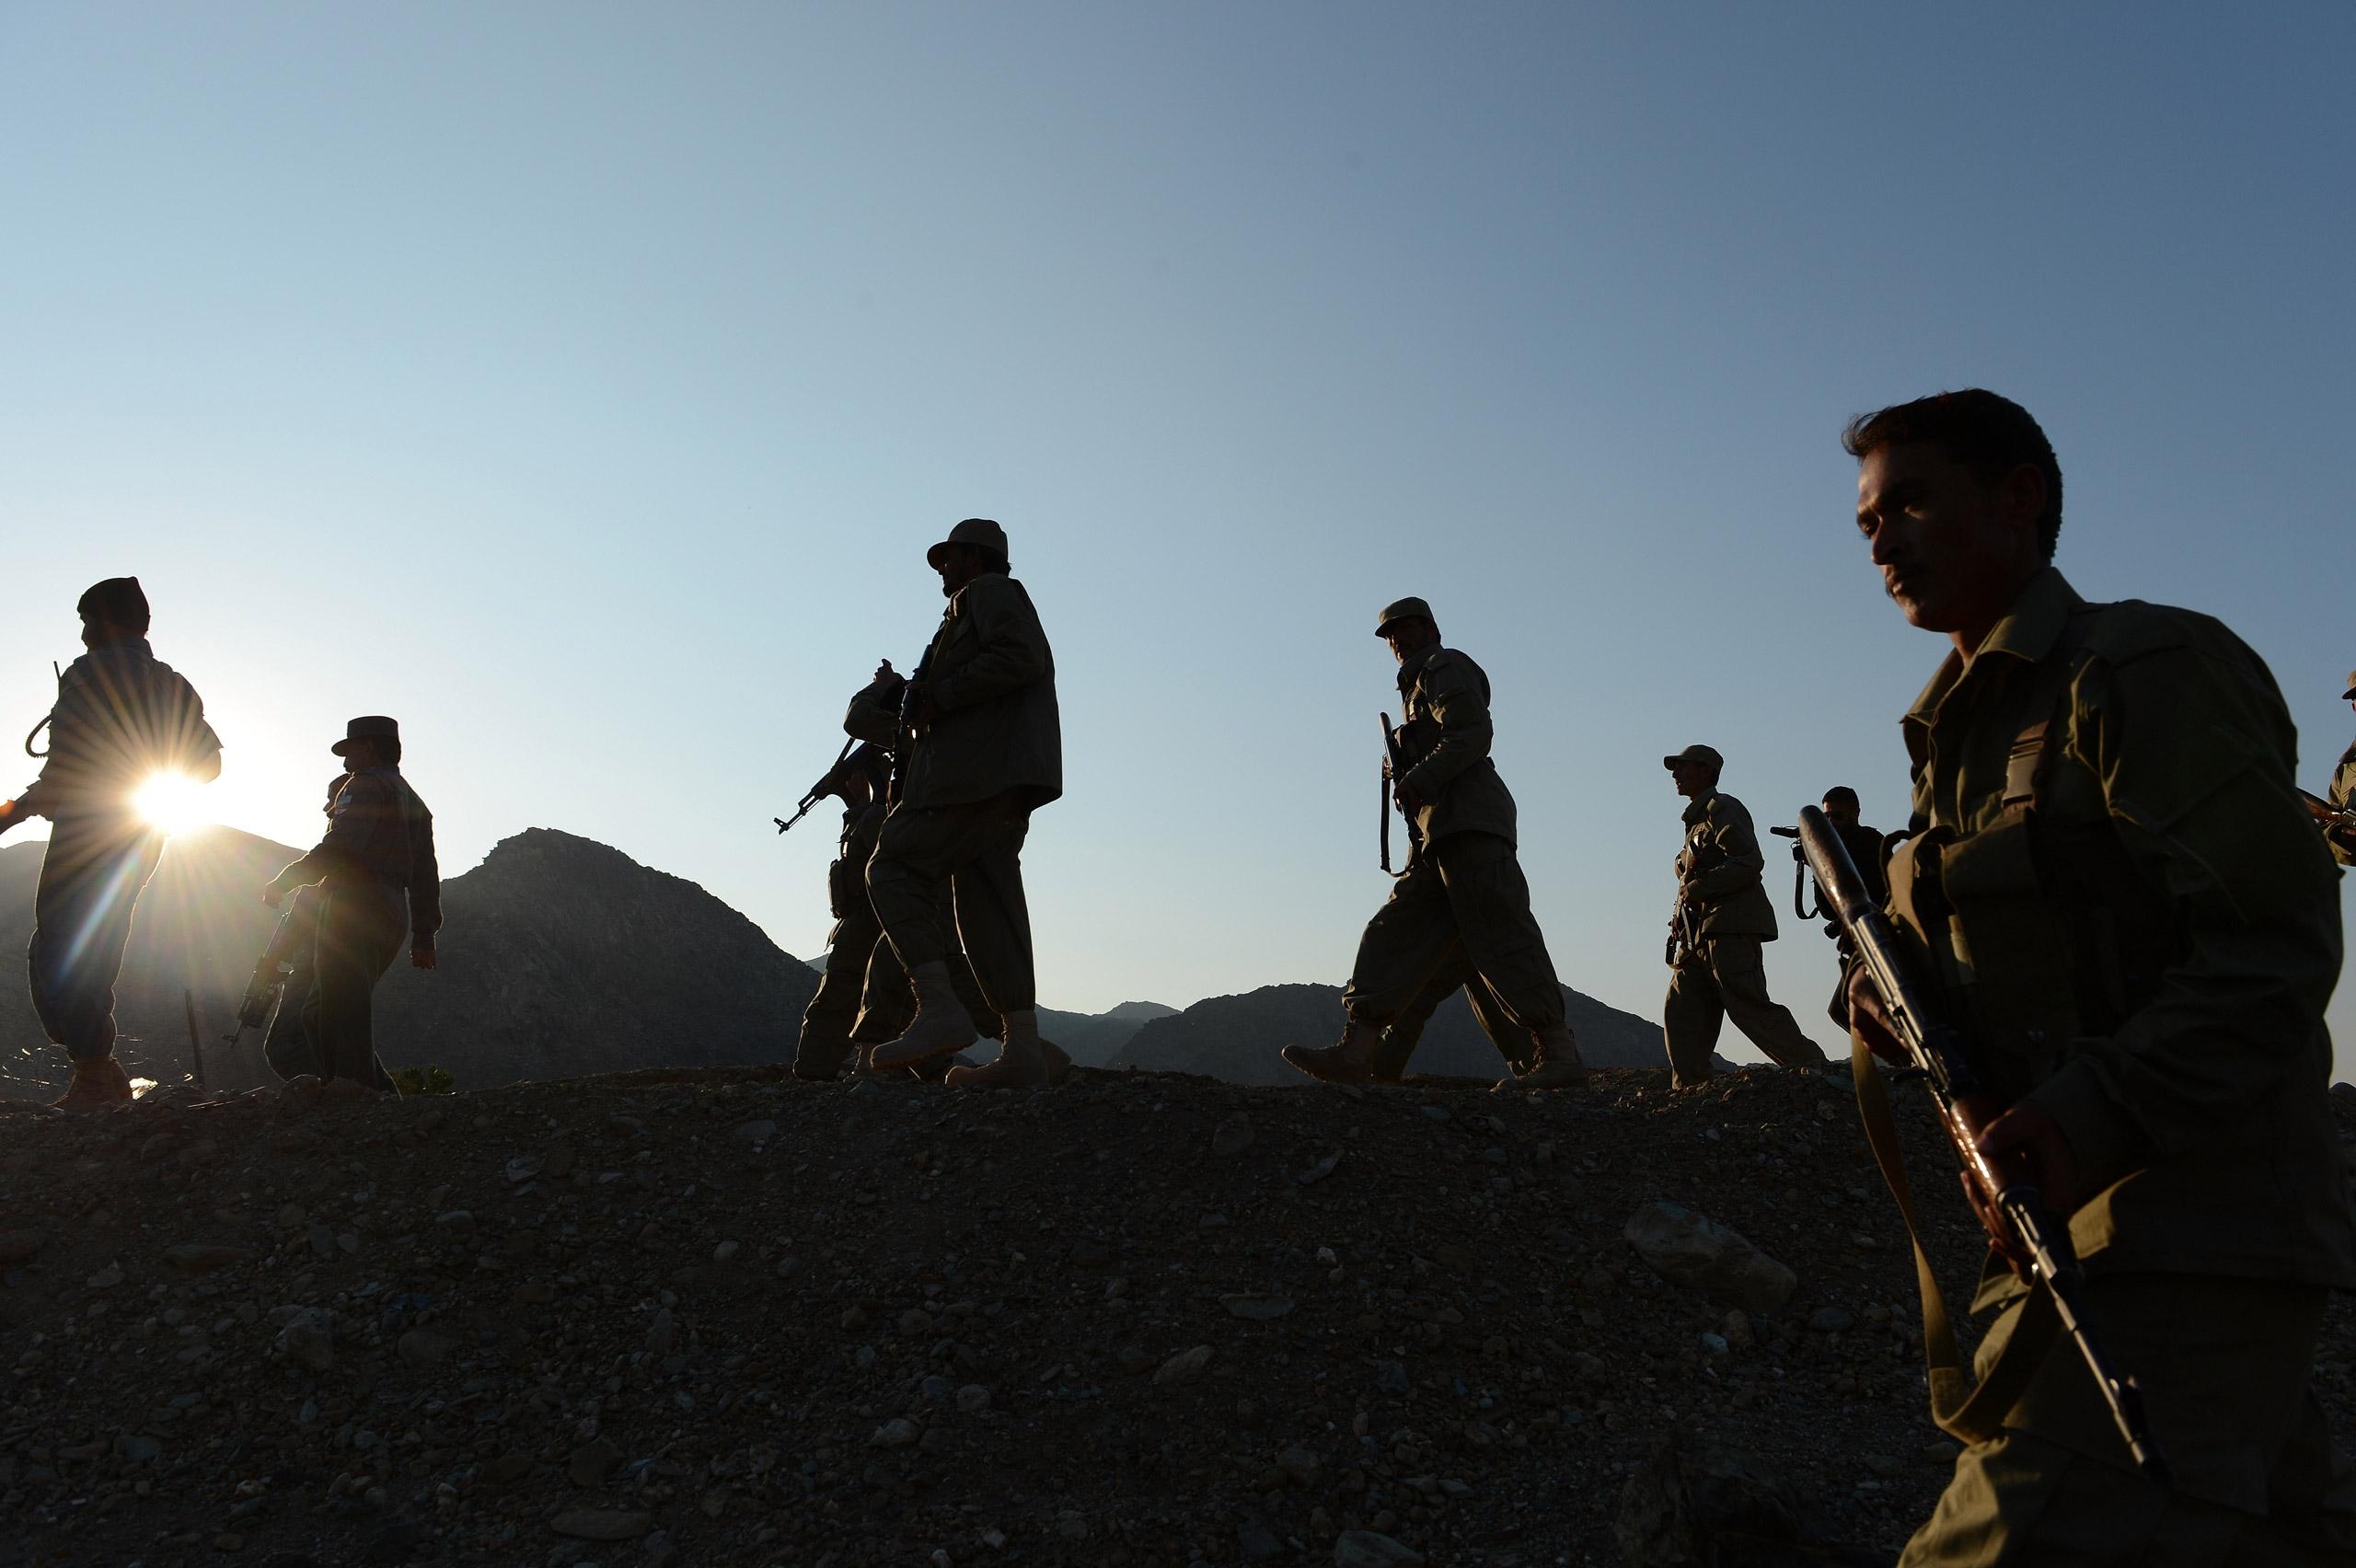 Afghan Local Police (ALP) personnel patrol near their base in Goshta district of Nangarhar province, on Dec. 18, 2012.